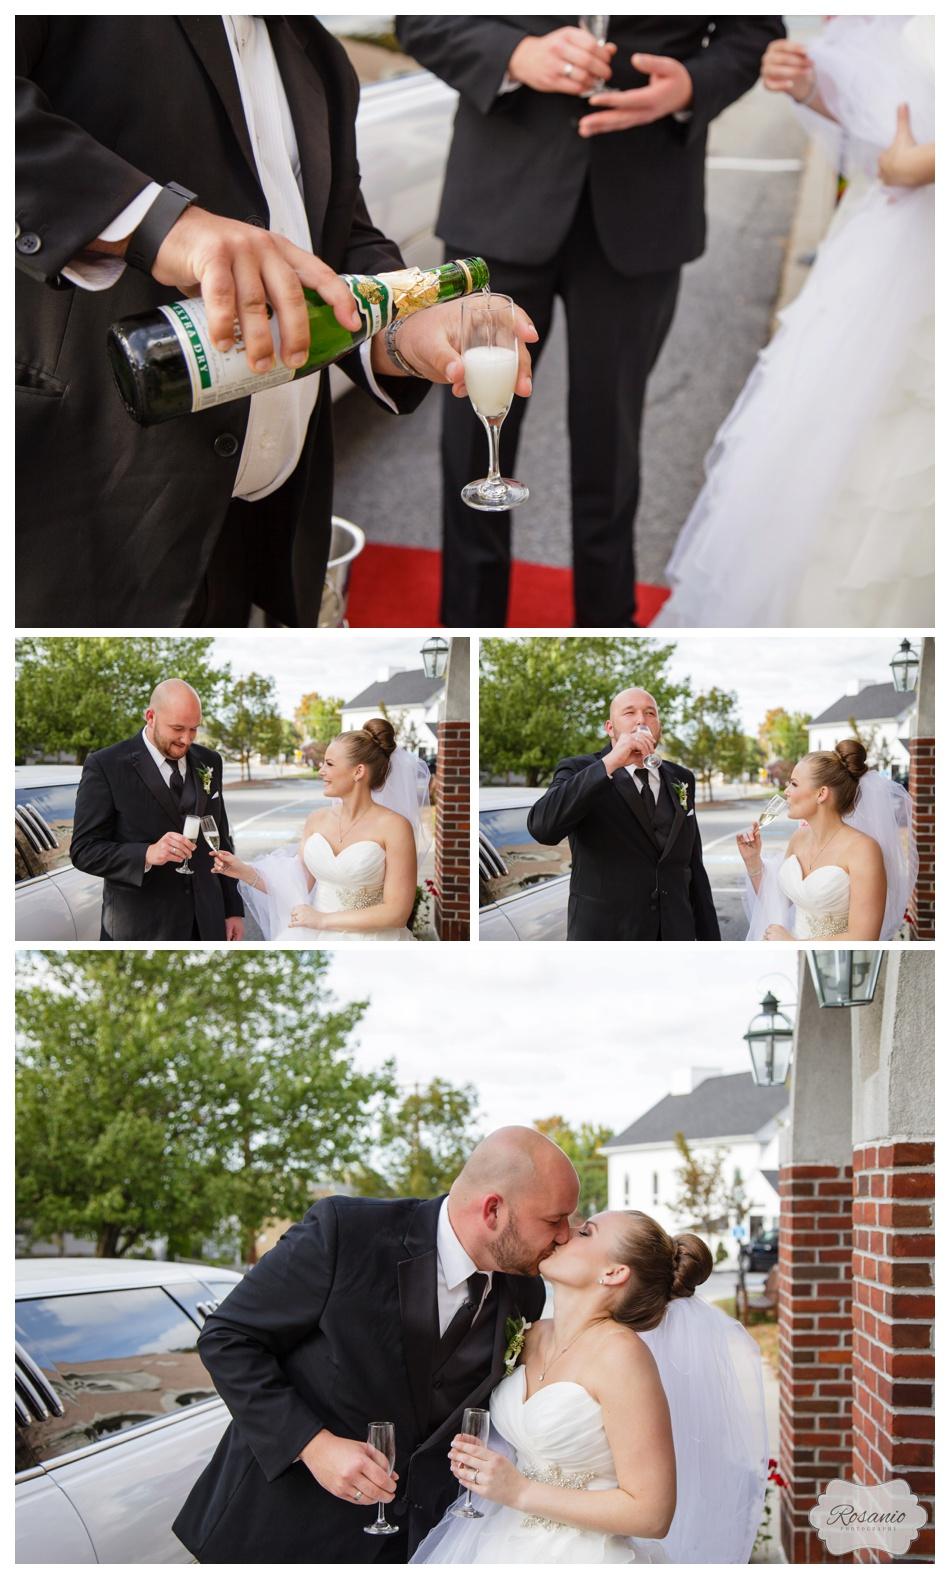 Rosanio Photography | Diburro's Haverhill MA | Massachusetts Wedding Photographer_0053.jpg